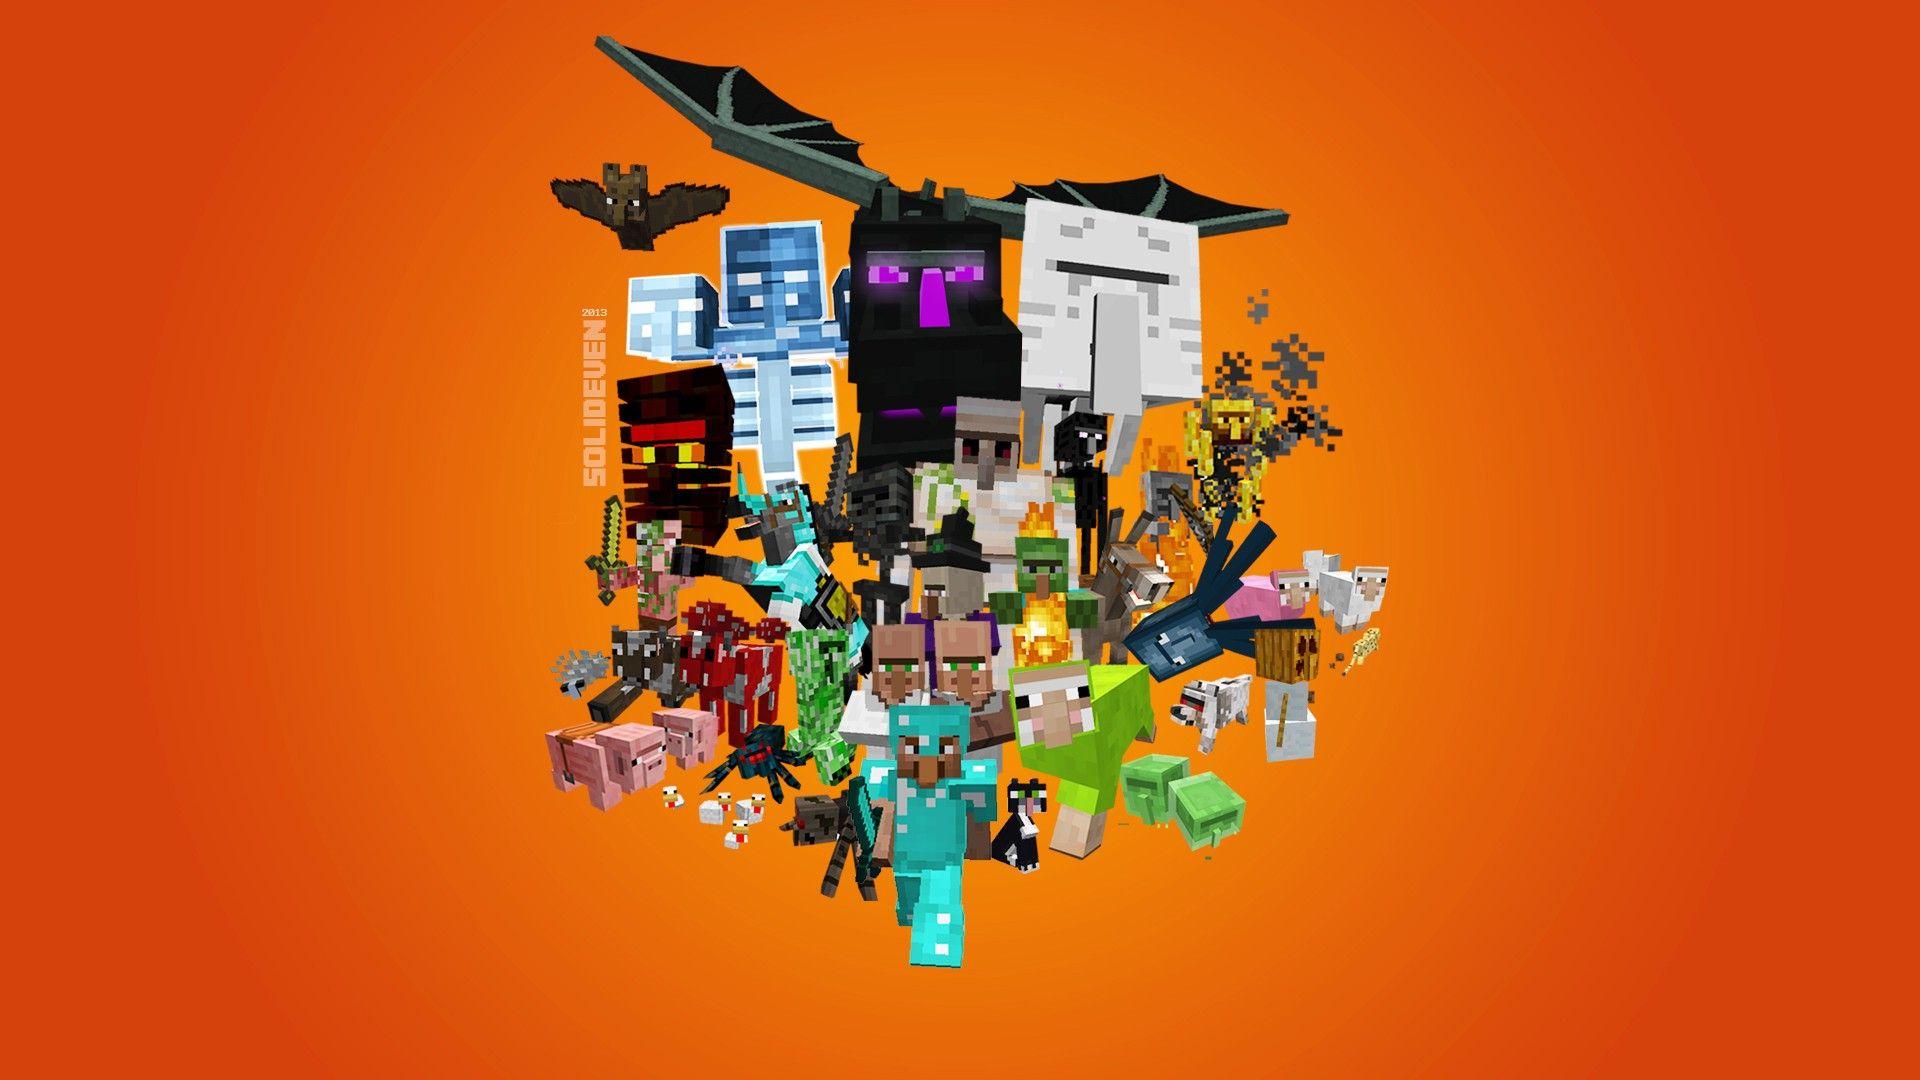 Good Wallpaper Minecraft Poster - 0bb40fa5e100ba49082a39393bc6f606  Gallery_949164.jpg